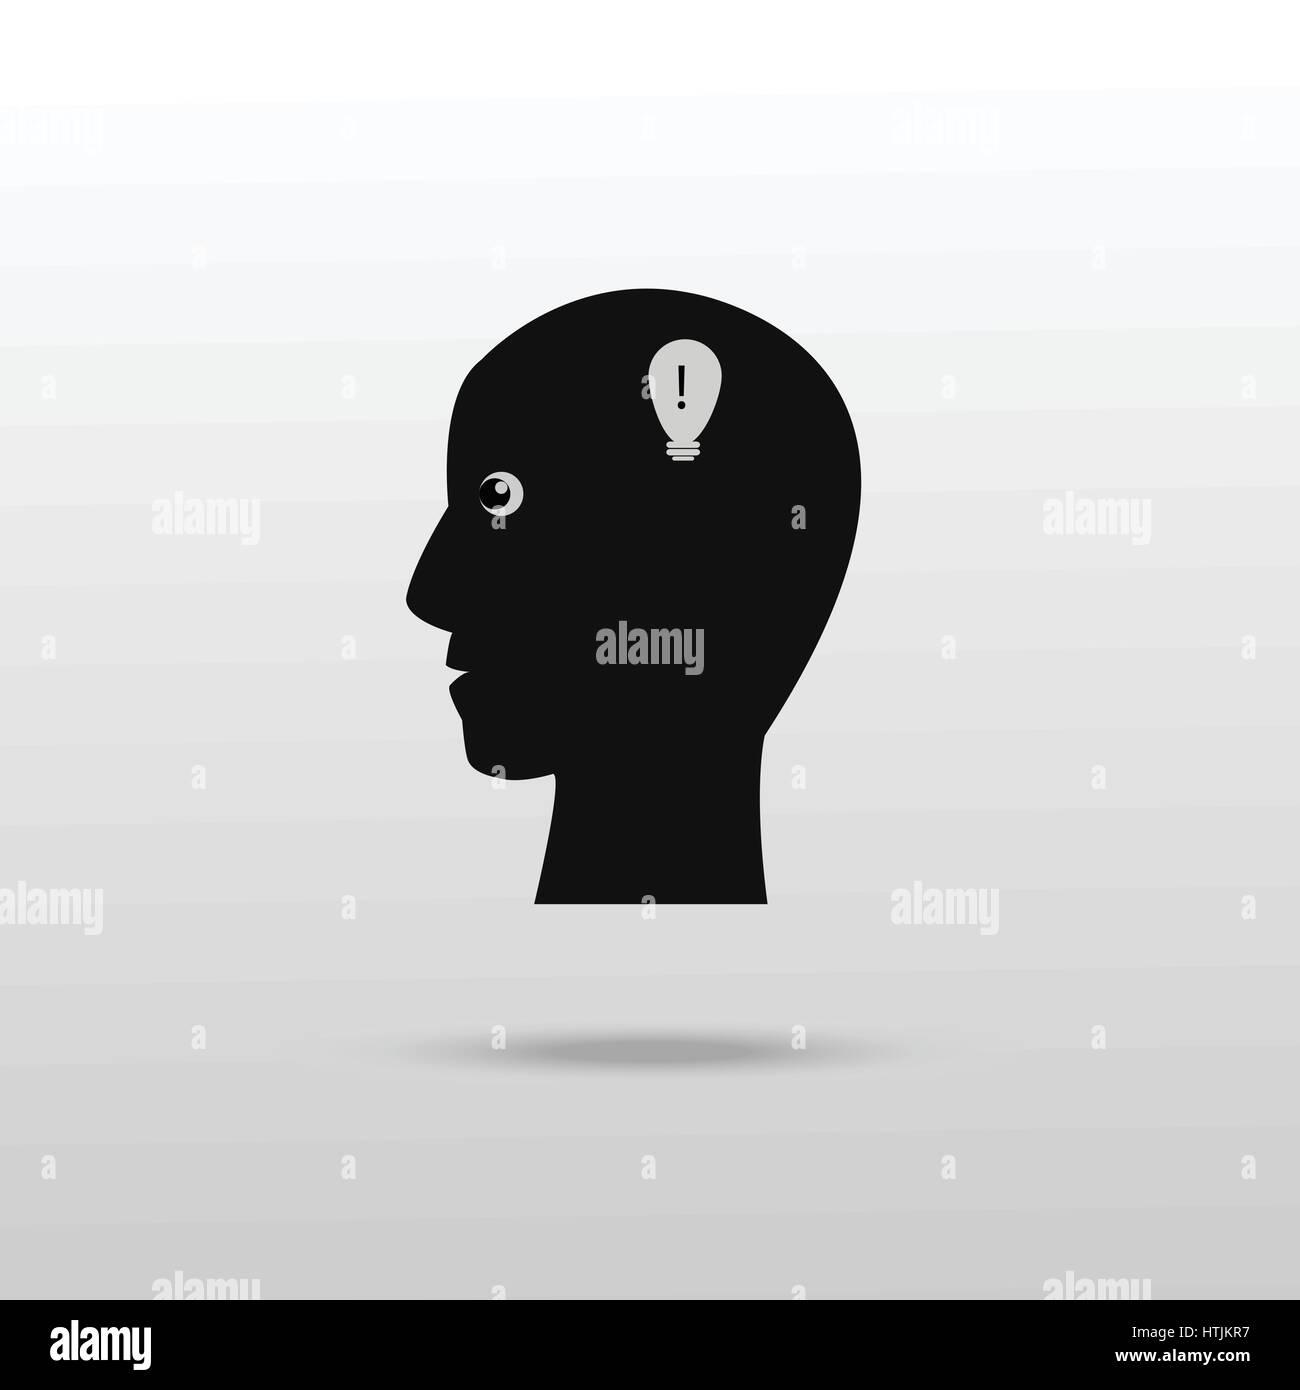 Human head with idea icon - Stock Image